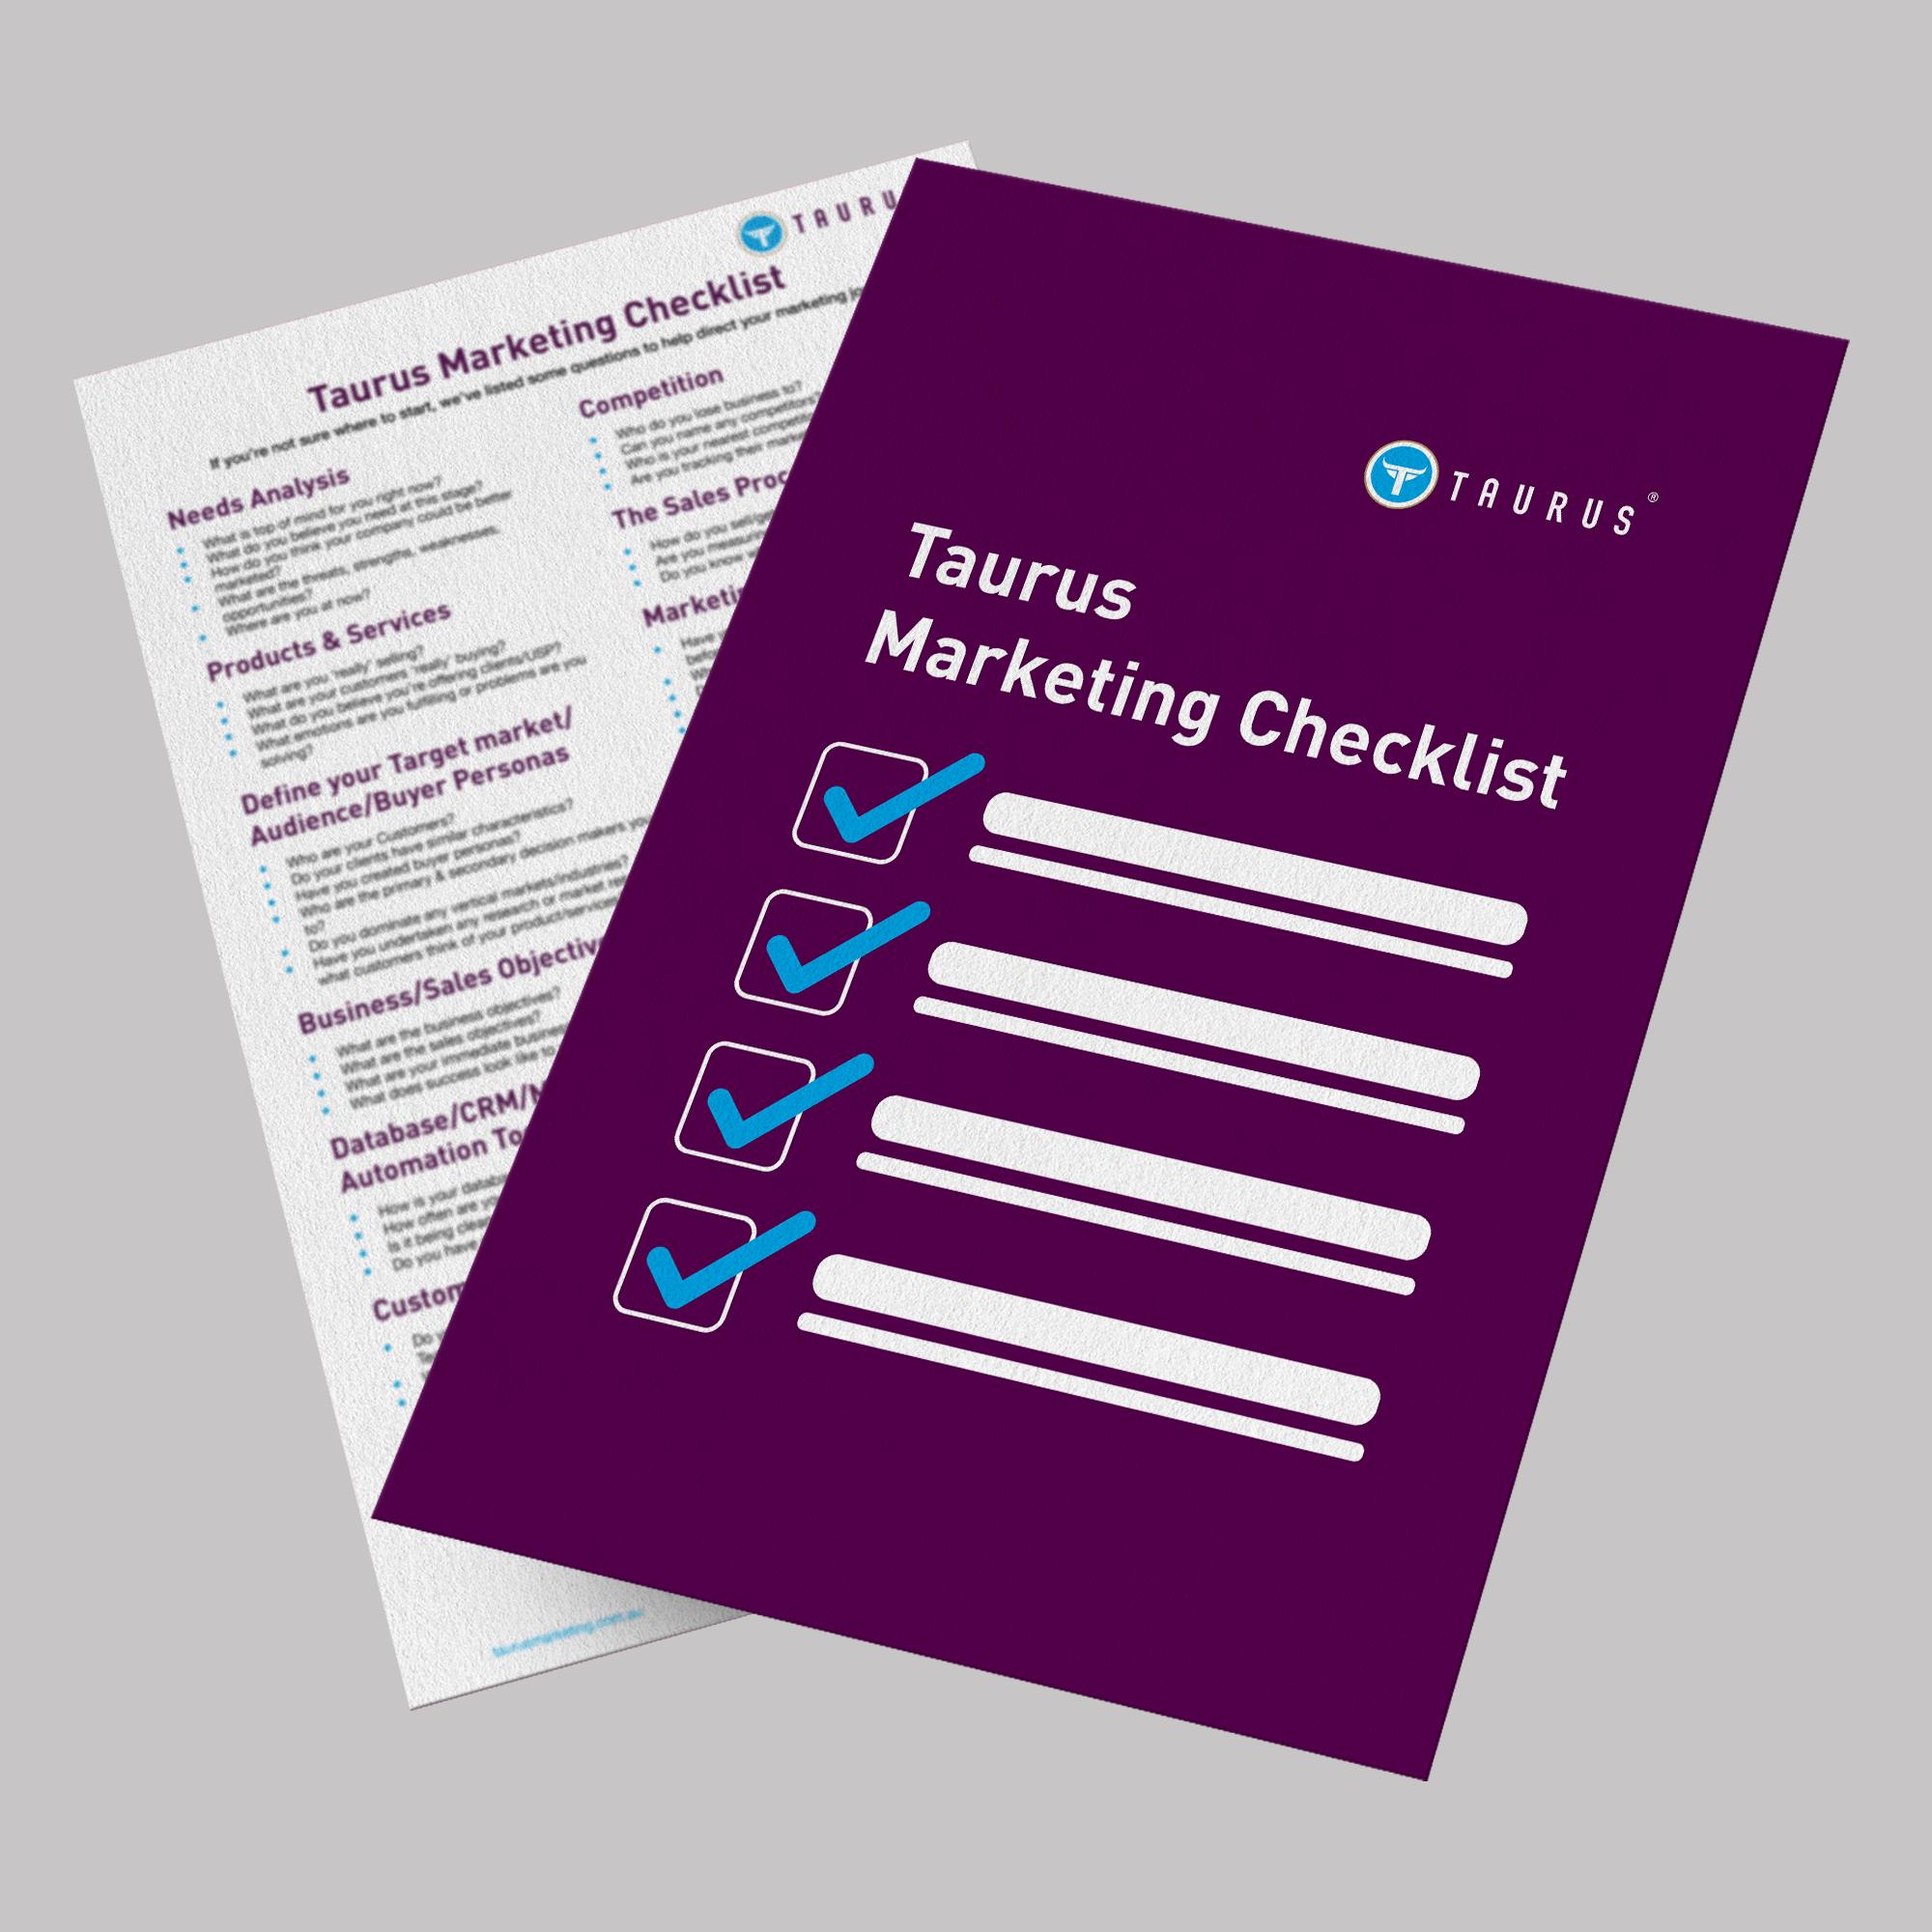 Sharon WIlliams Taurus Marketing, Marketing Checklist